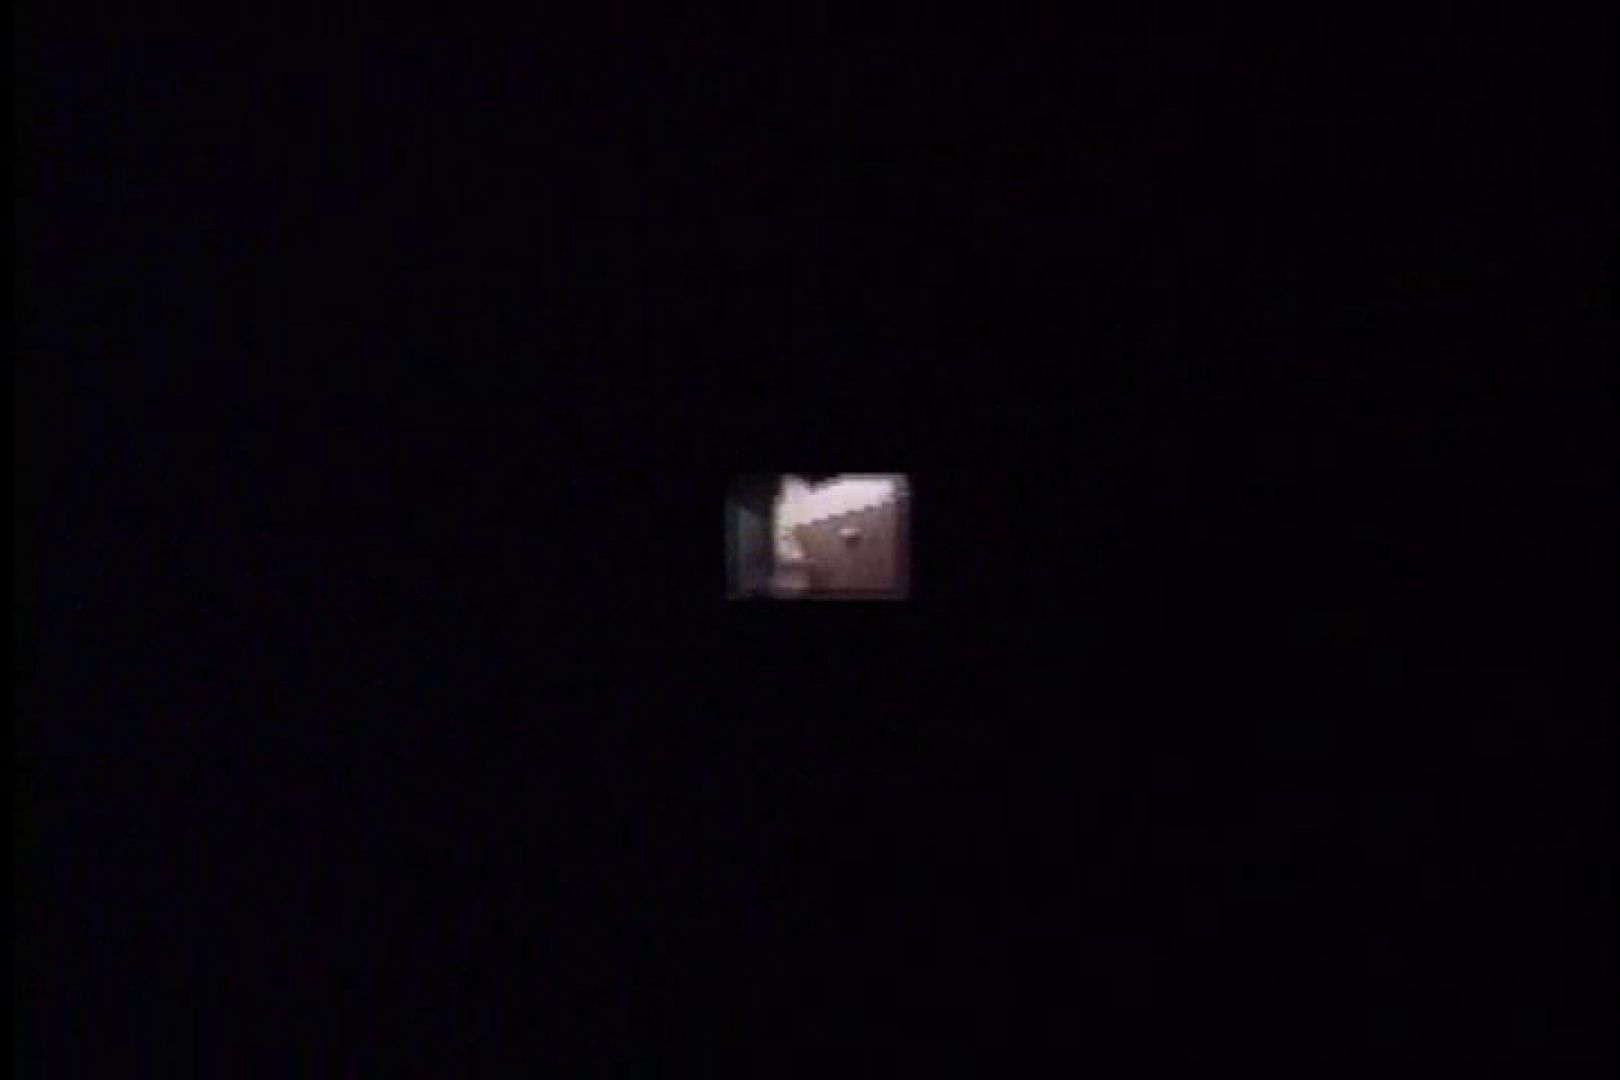 STY-016 女子大生●盗撮 お便所百選・百態の職人芸 後編 女子大生丸裸 | 盗撮師作品  95pic 94